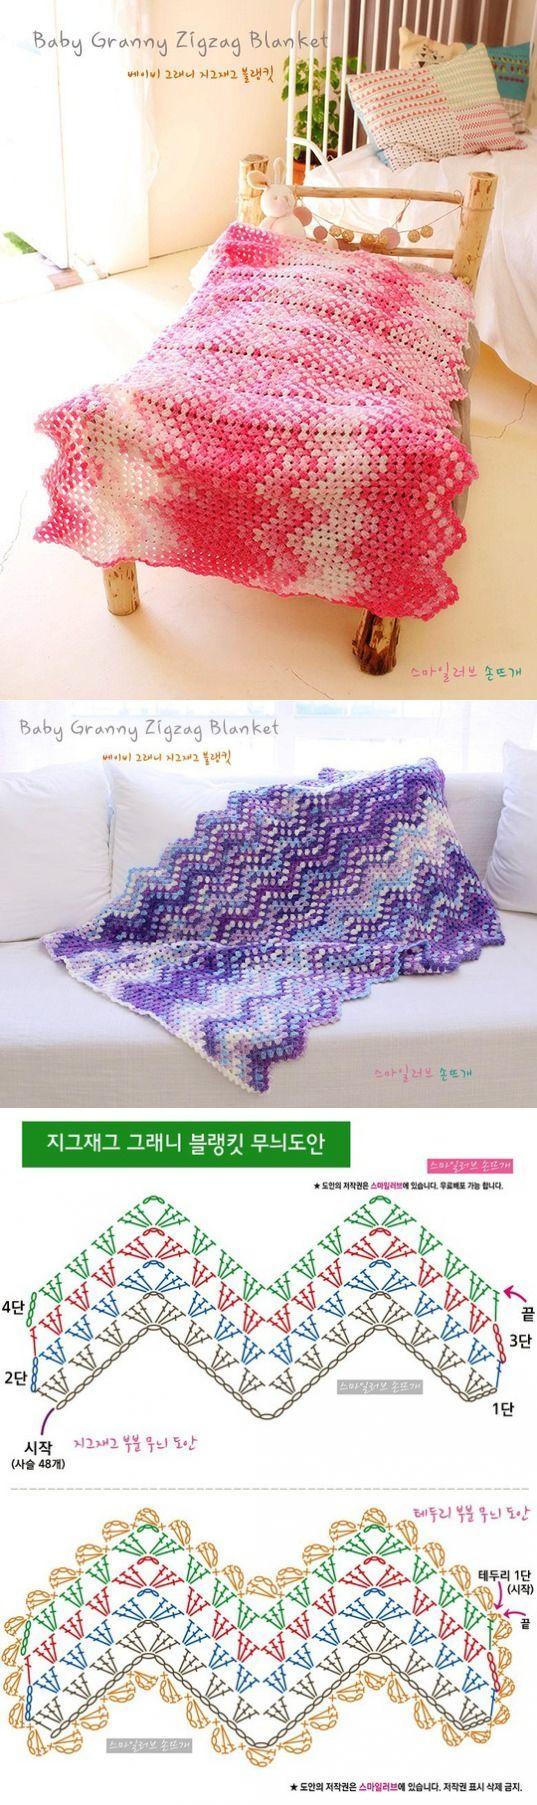 пледы подушки коврики прихватки | Manta, Colchas y Tejido